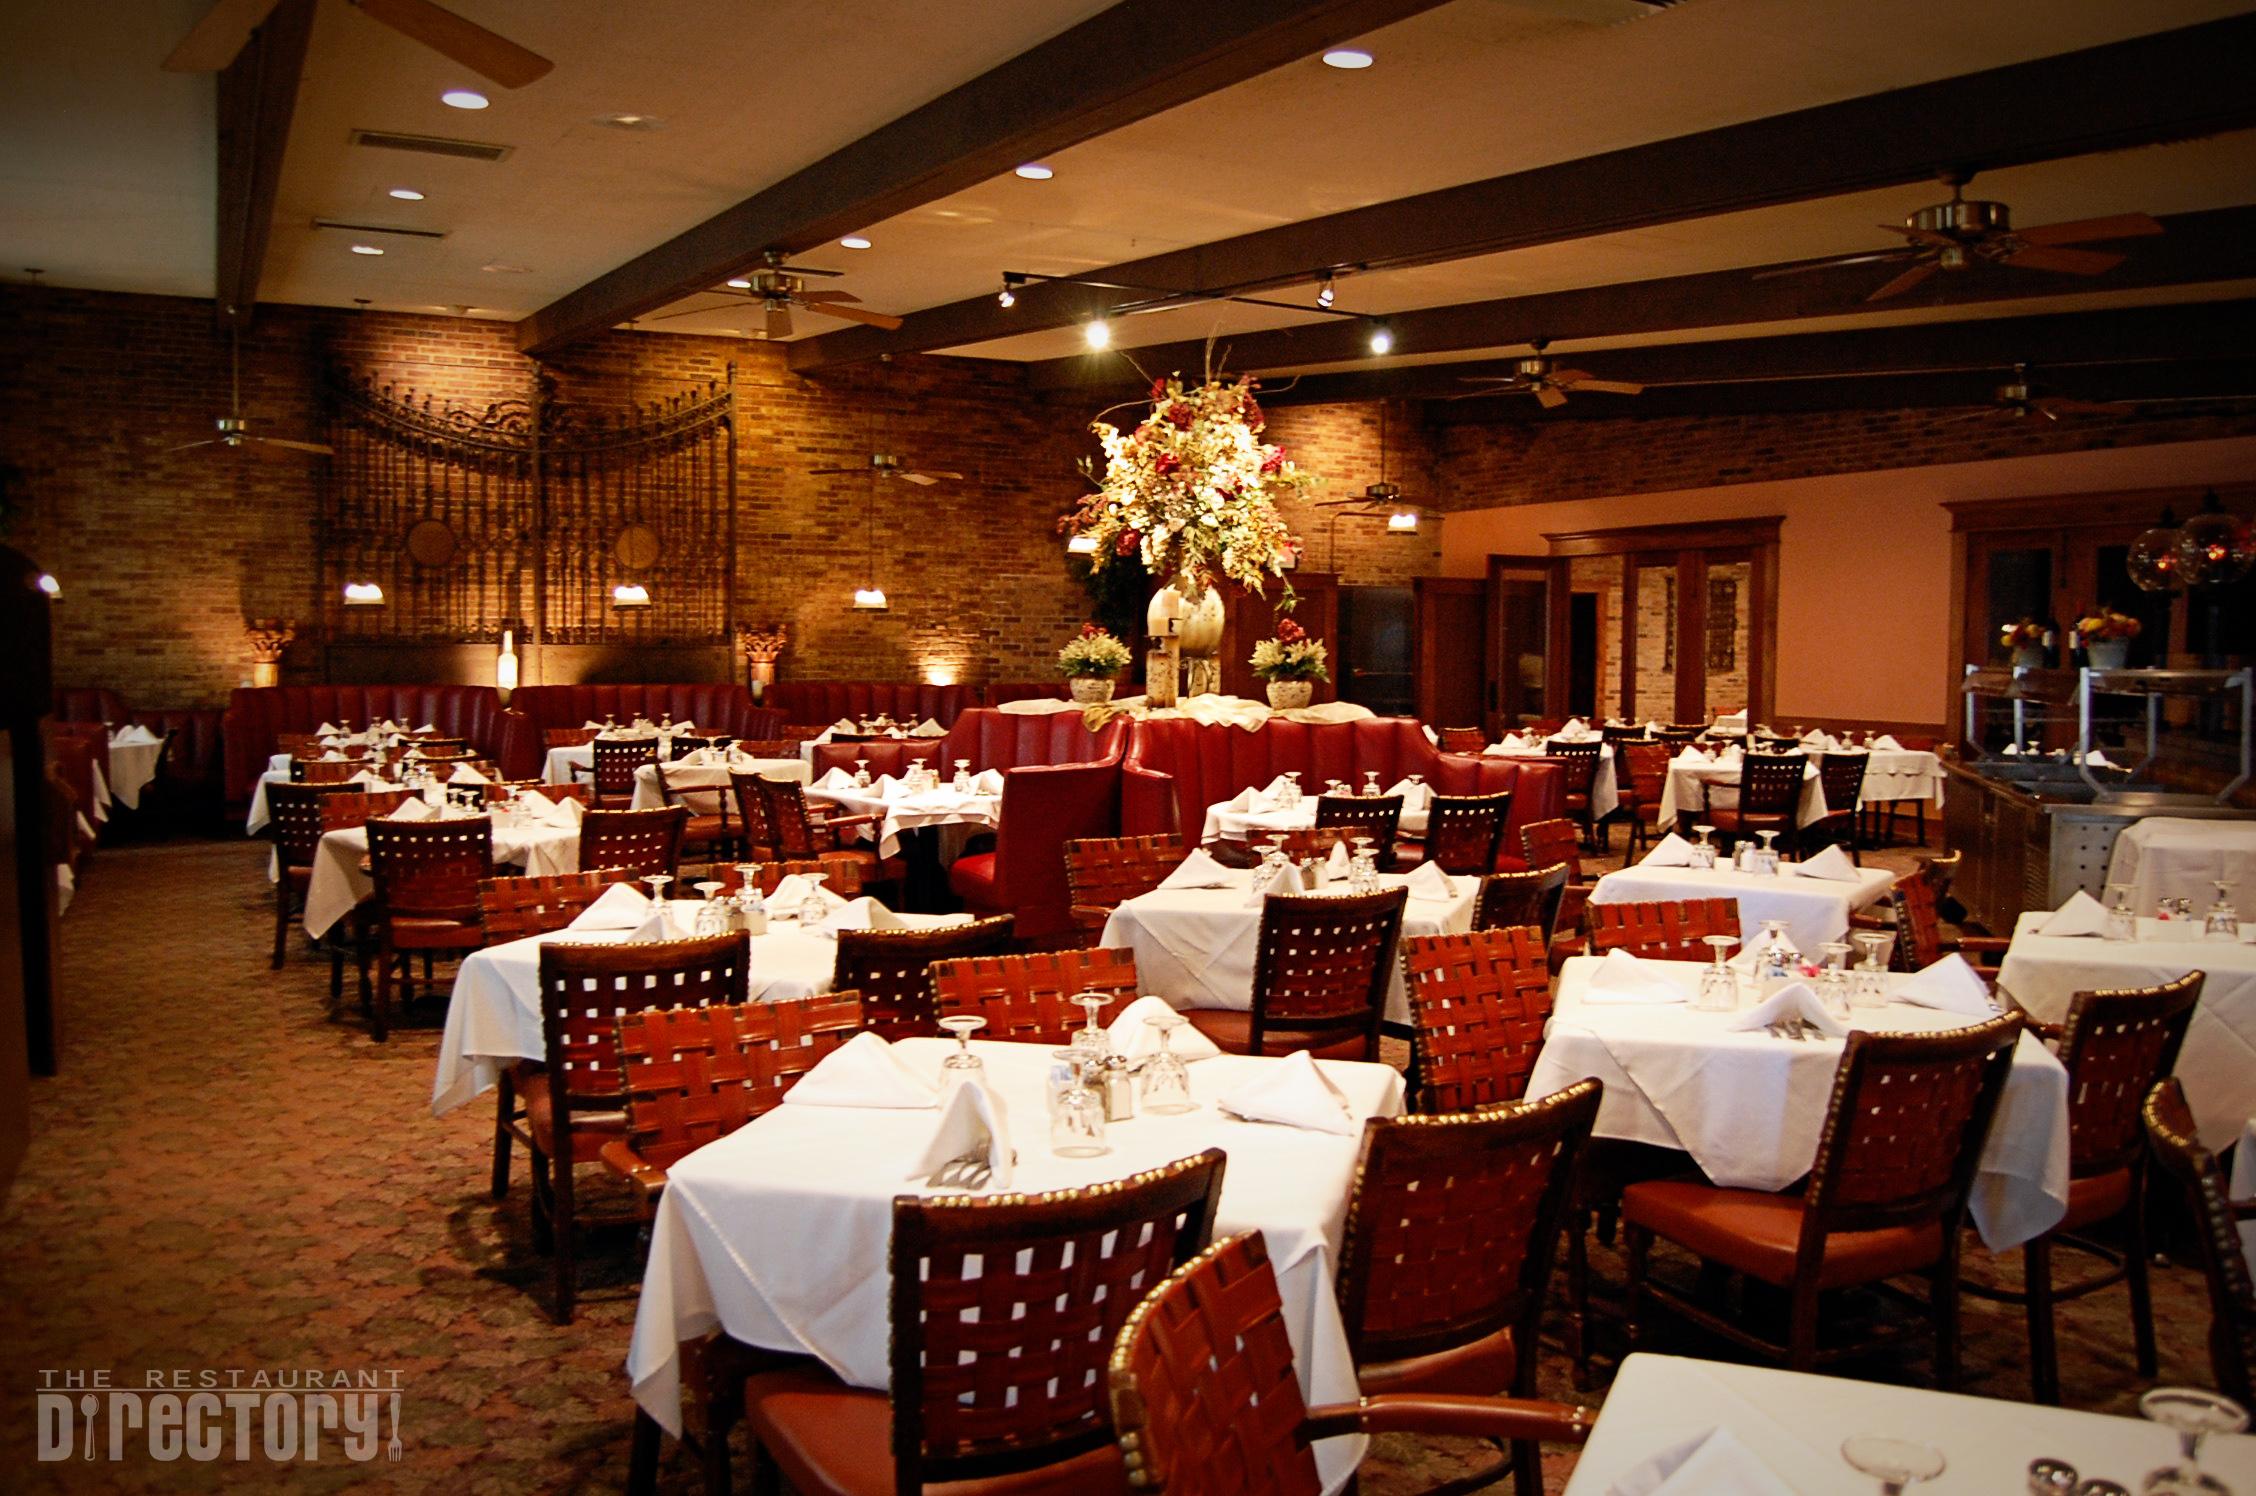 Al S Steakhouse Enjoy Illinois